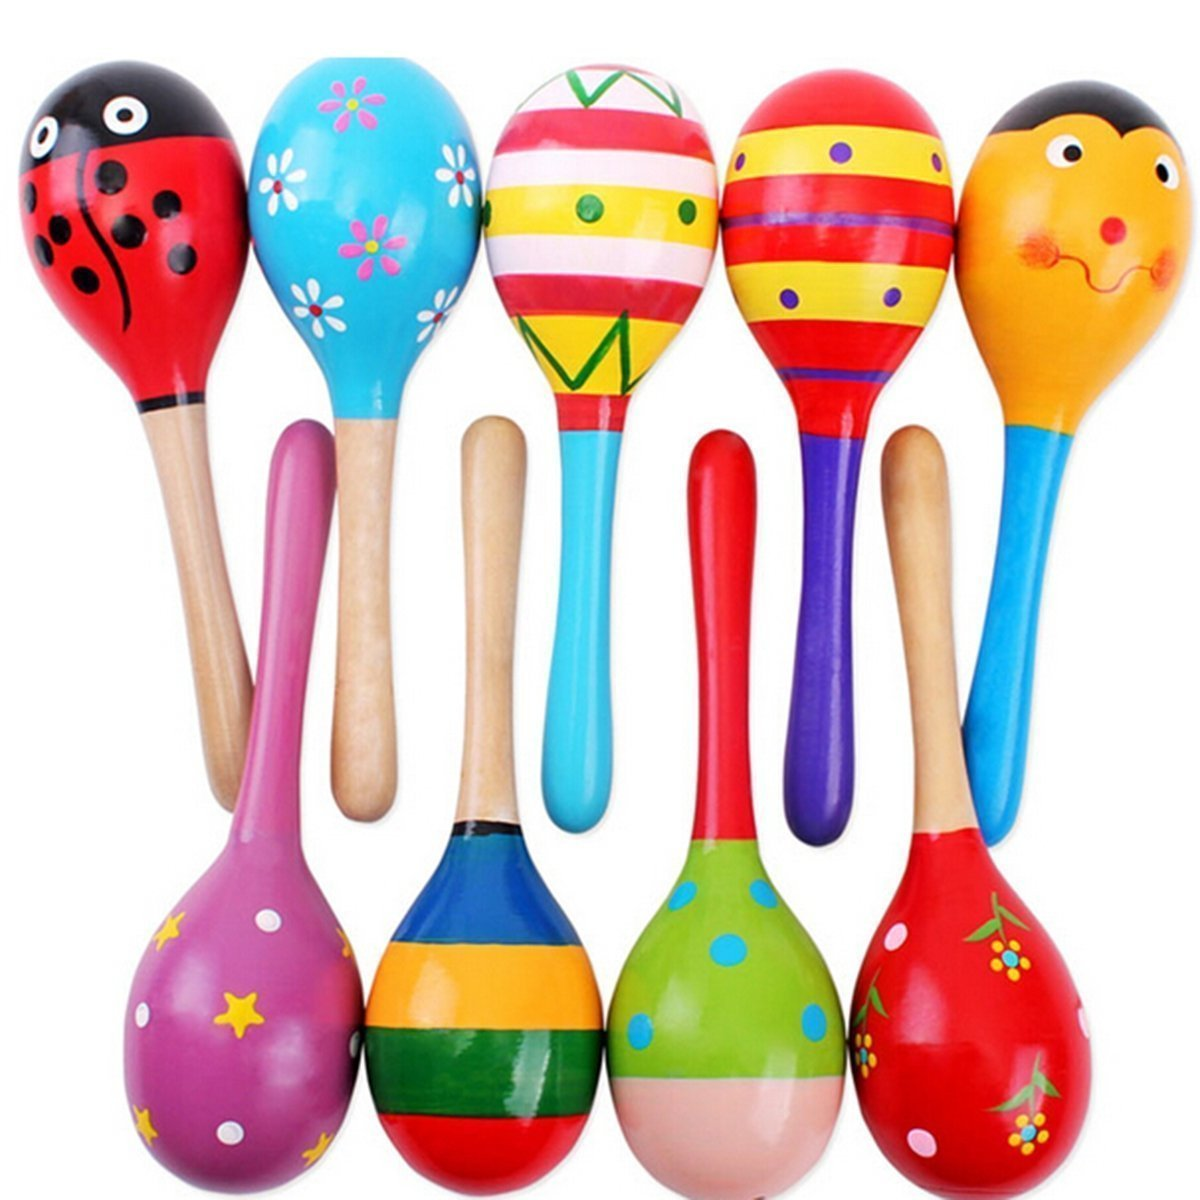 Woode Maraca Rattles Egg Shakers for Babies楽器子供ミュージカルおもちゃ ブラック 1224ALI B07BHQHKF5  5 Sand Hammer Toys